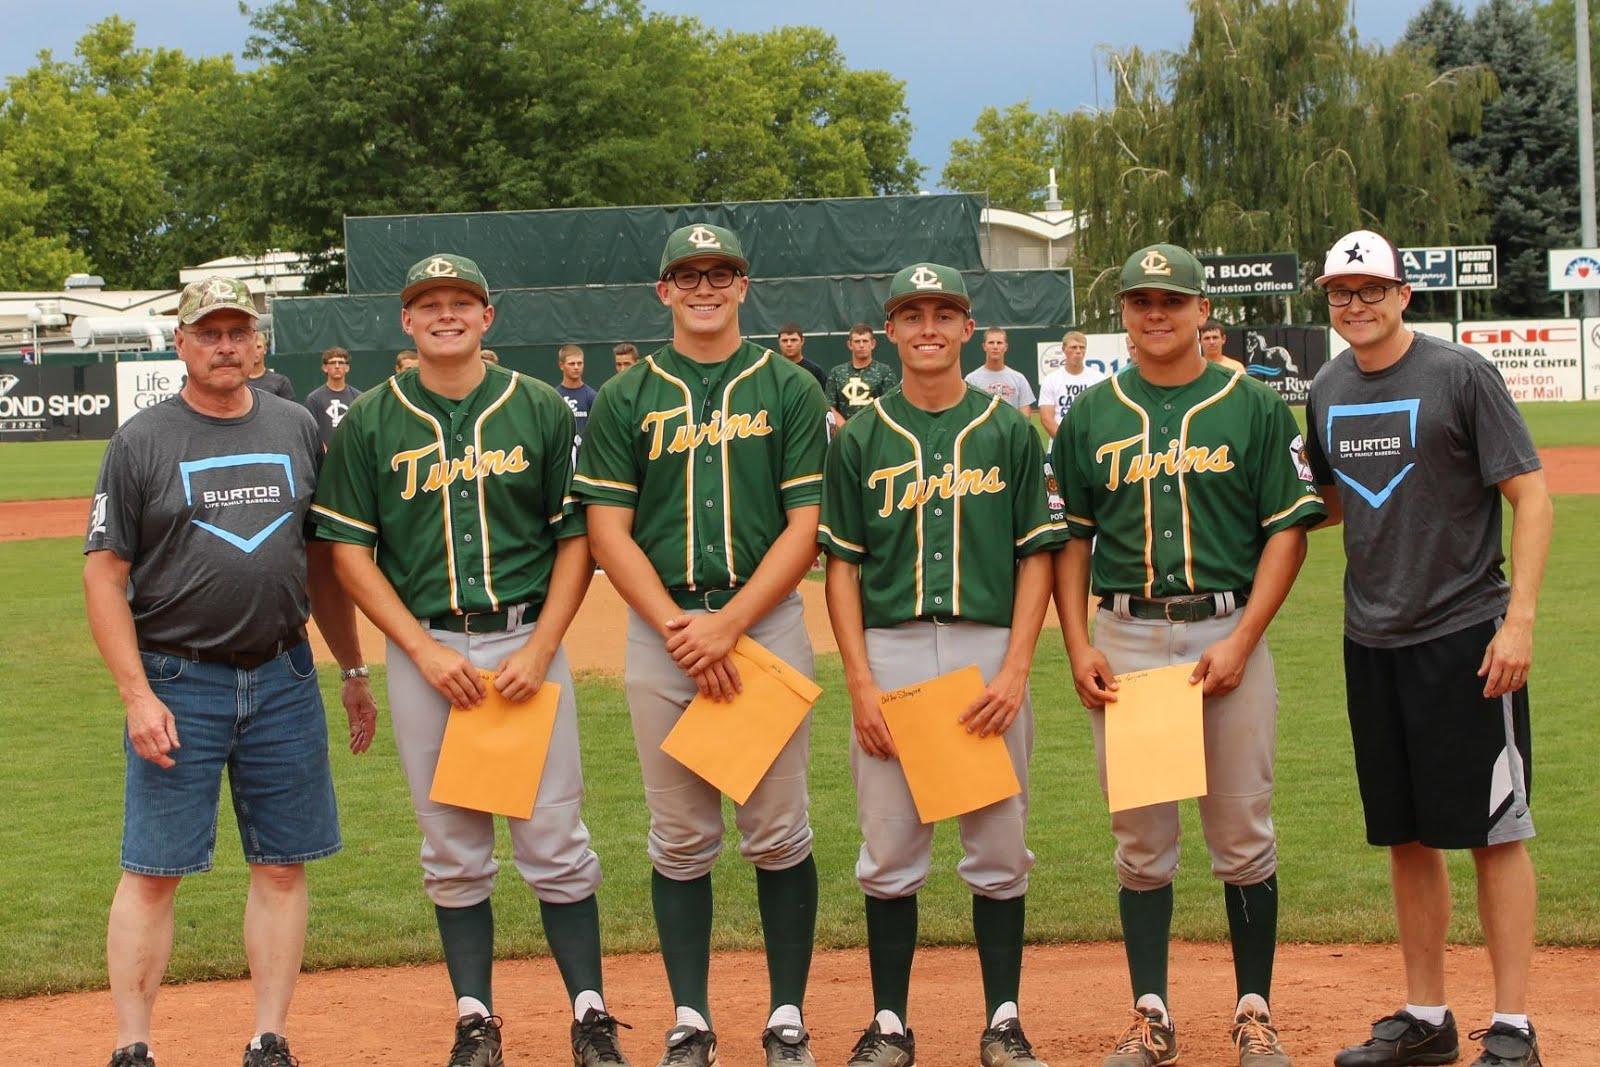 $500 Scholarship Winners - Joshua Moore, Logan Chase, Dalton Stamper, Cole Grijalva